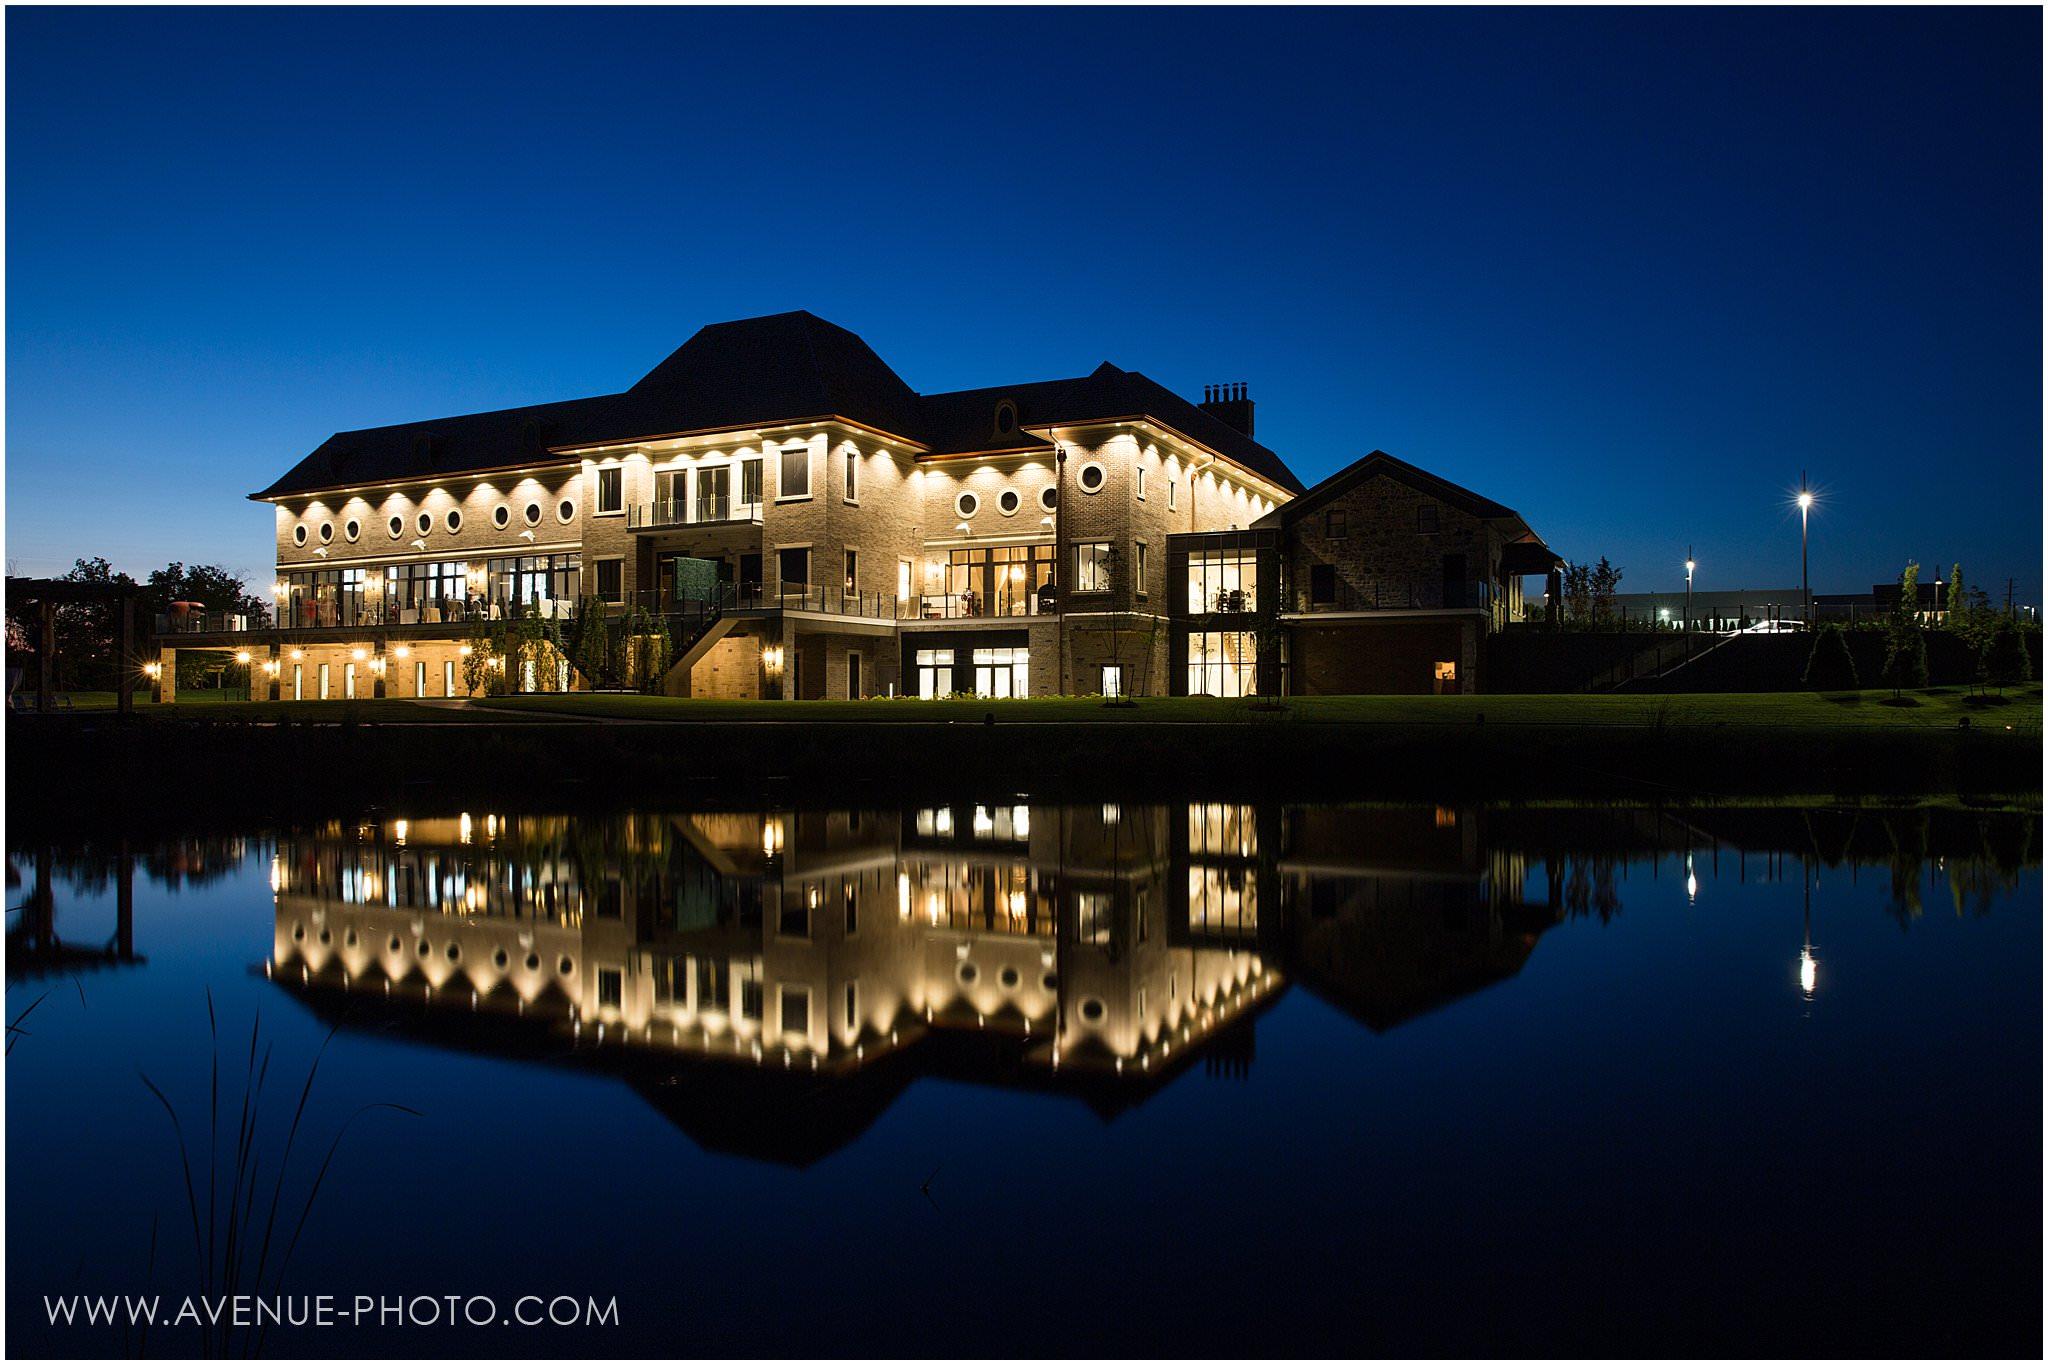 The Arlington Estate Wedding Photos - Kleinburg Wedding Photography, Exterior at Night